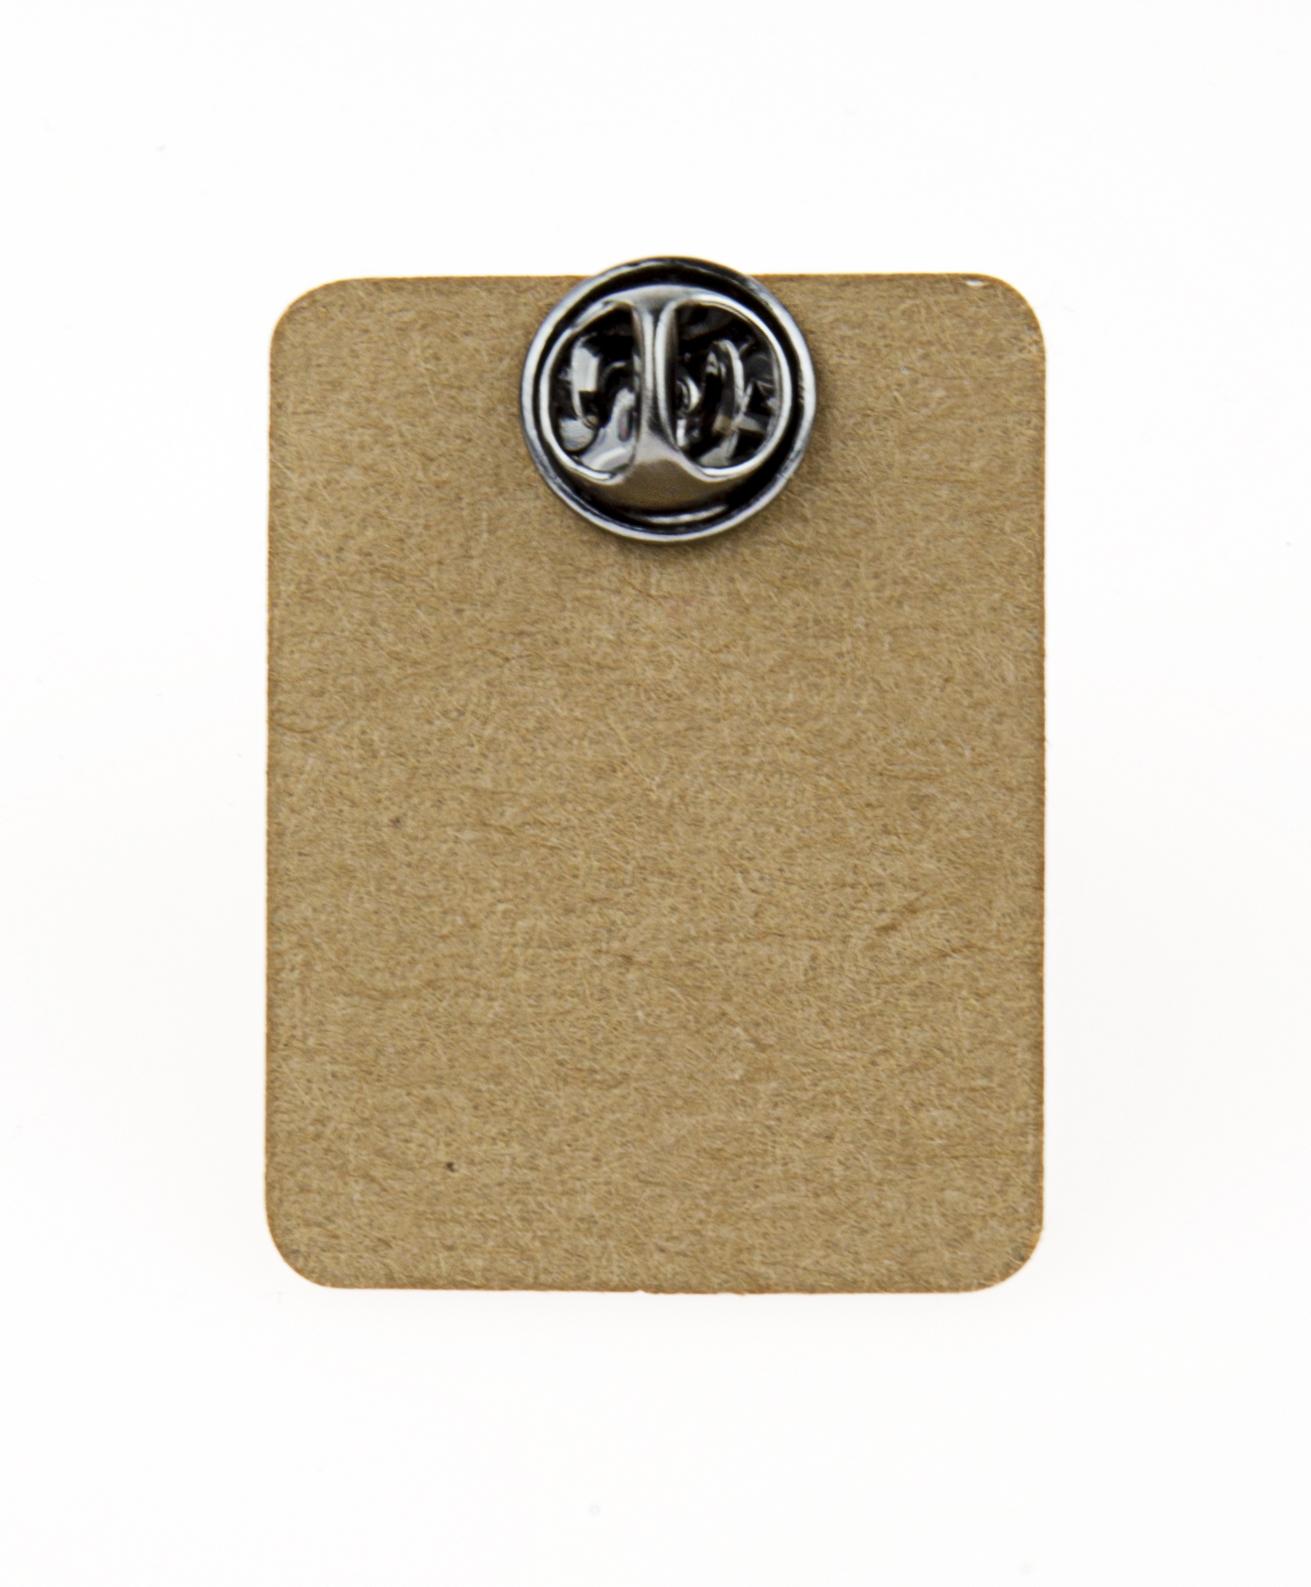 Metal Paint Brush Rainbow Enamel Pin Badge